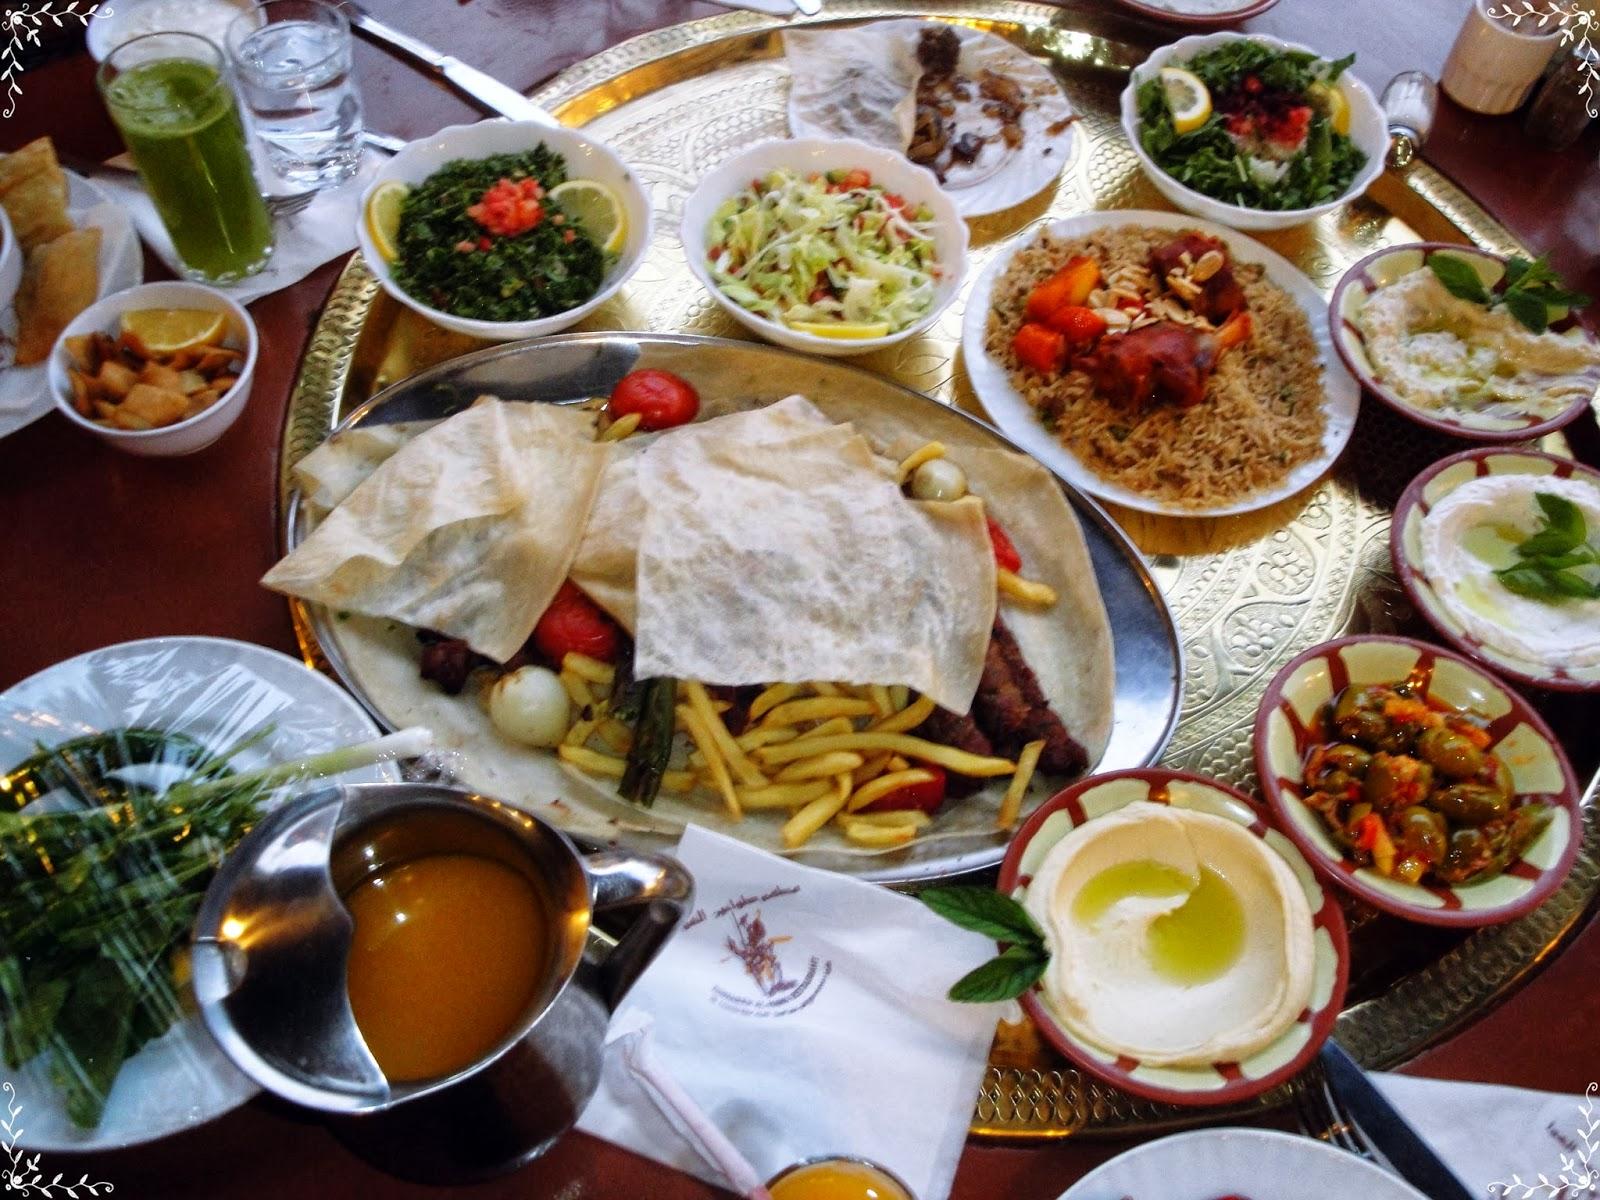 Jordan-Adam-Lucente-food.jpg